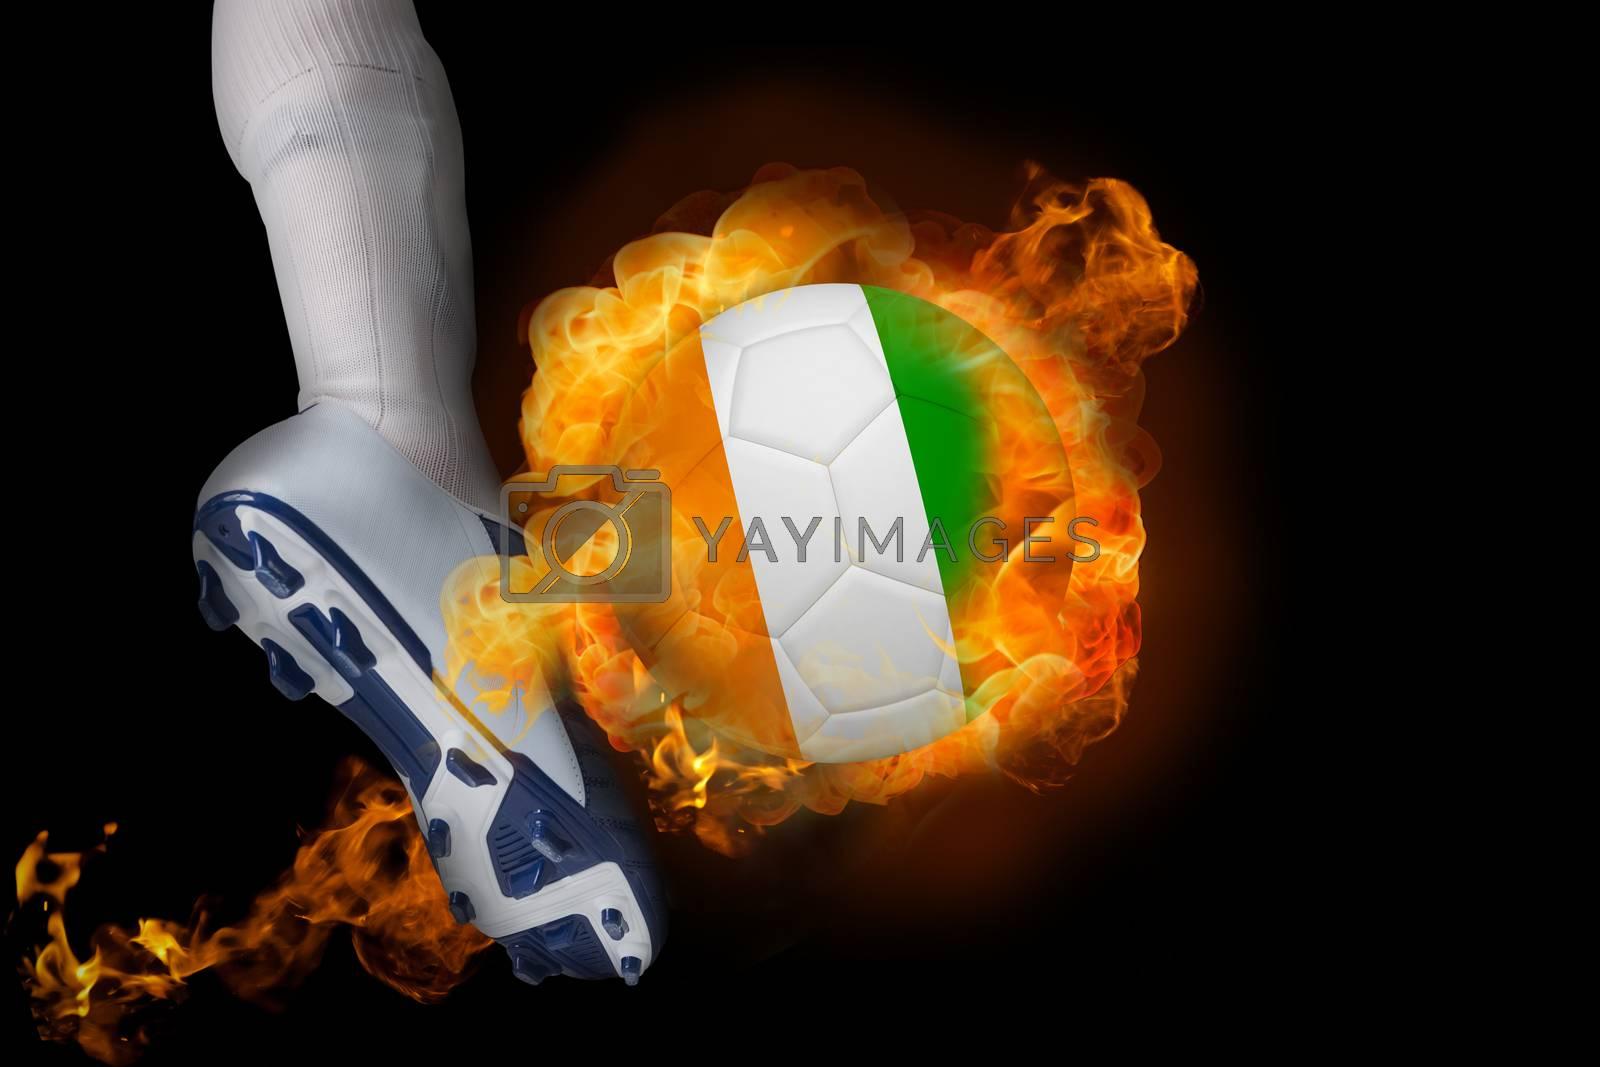 Football player kicking flaming ivory coast ball by Wavebreakmedia